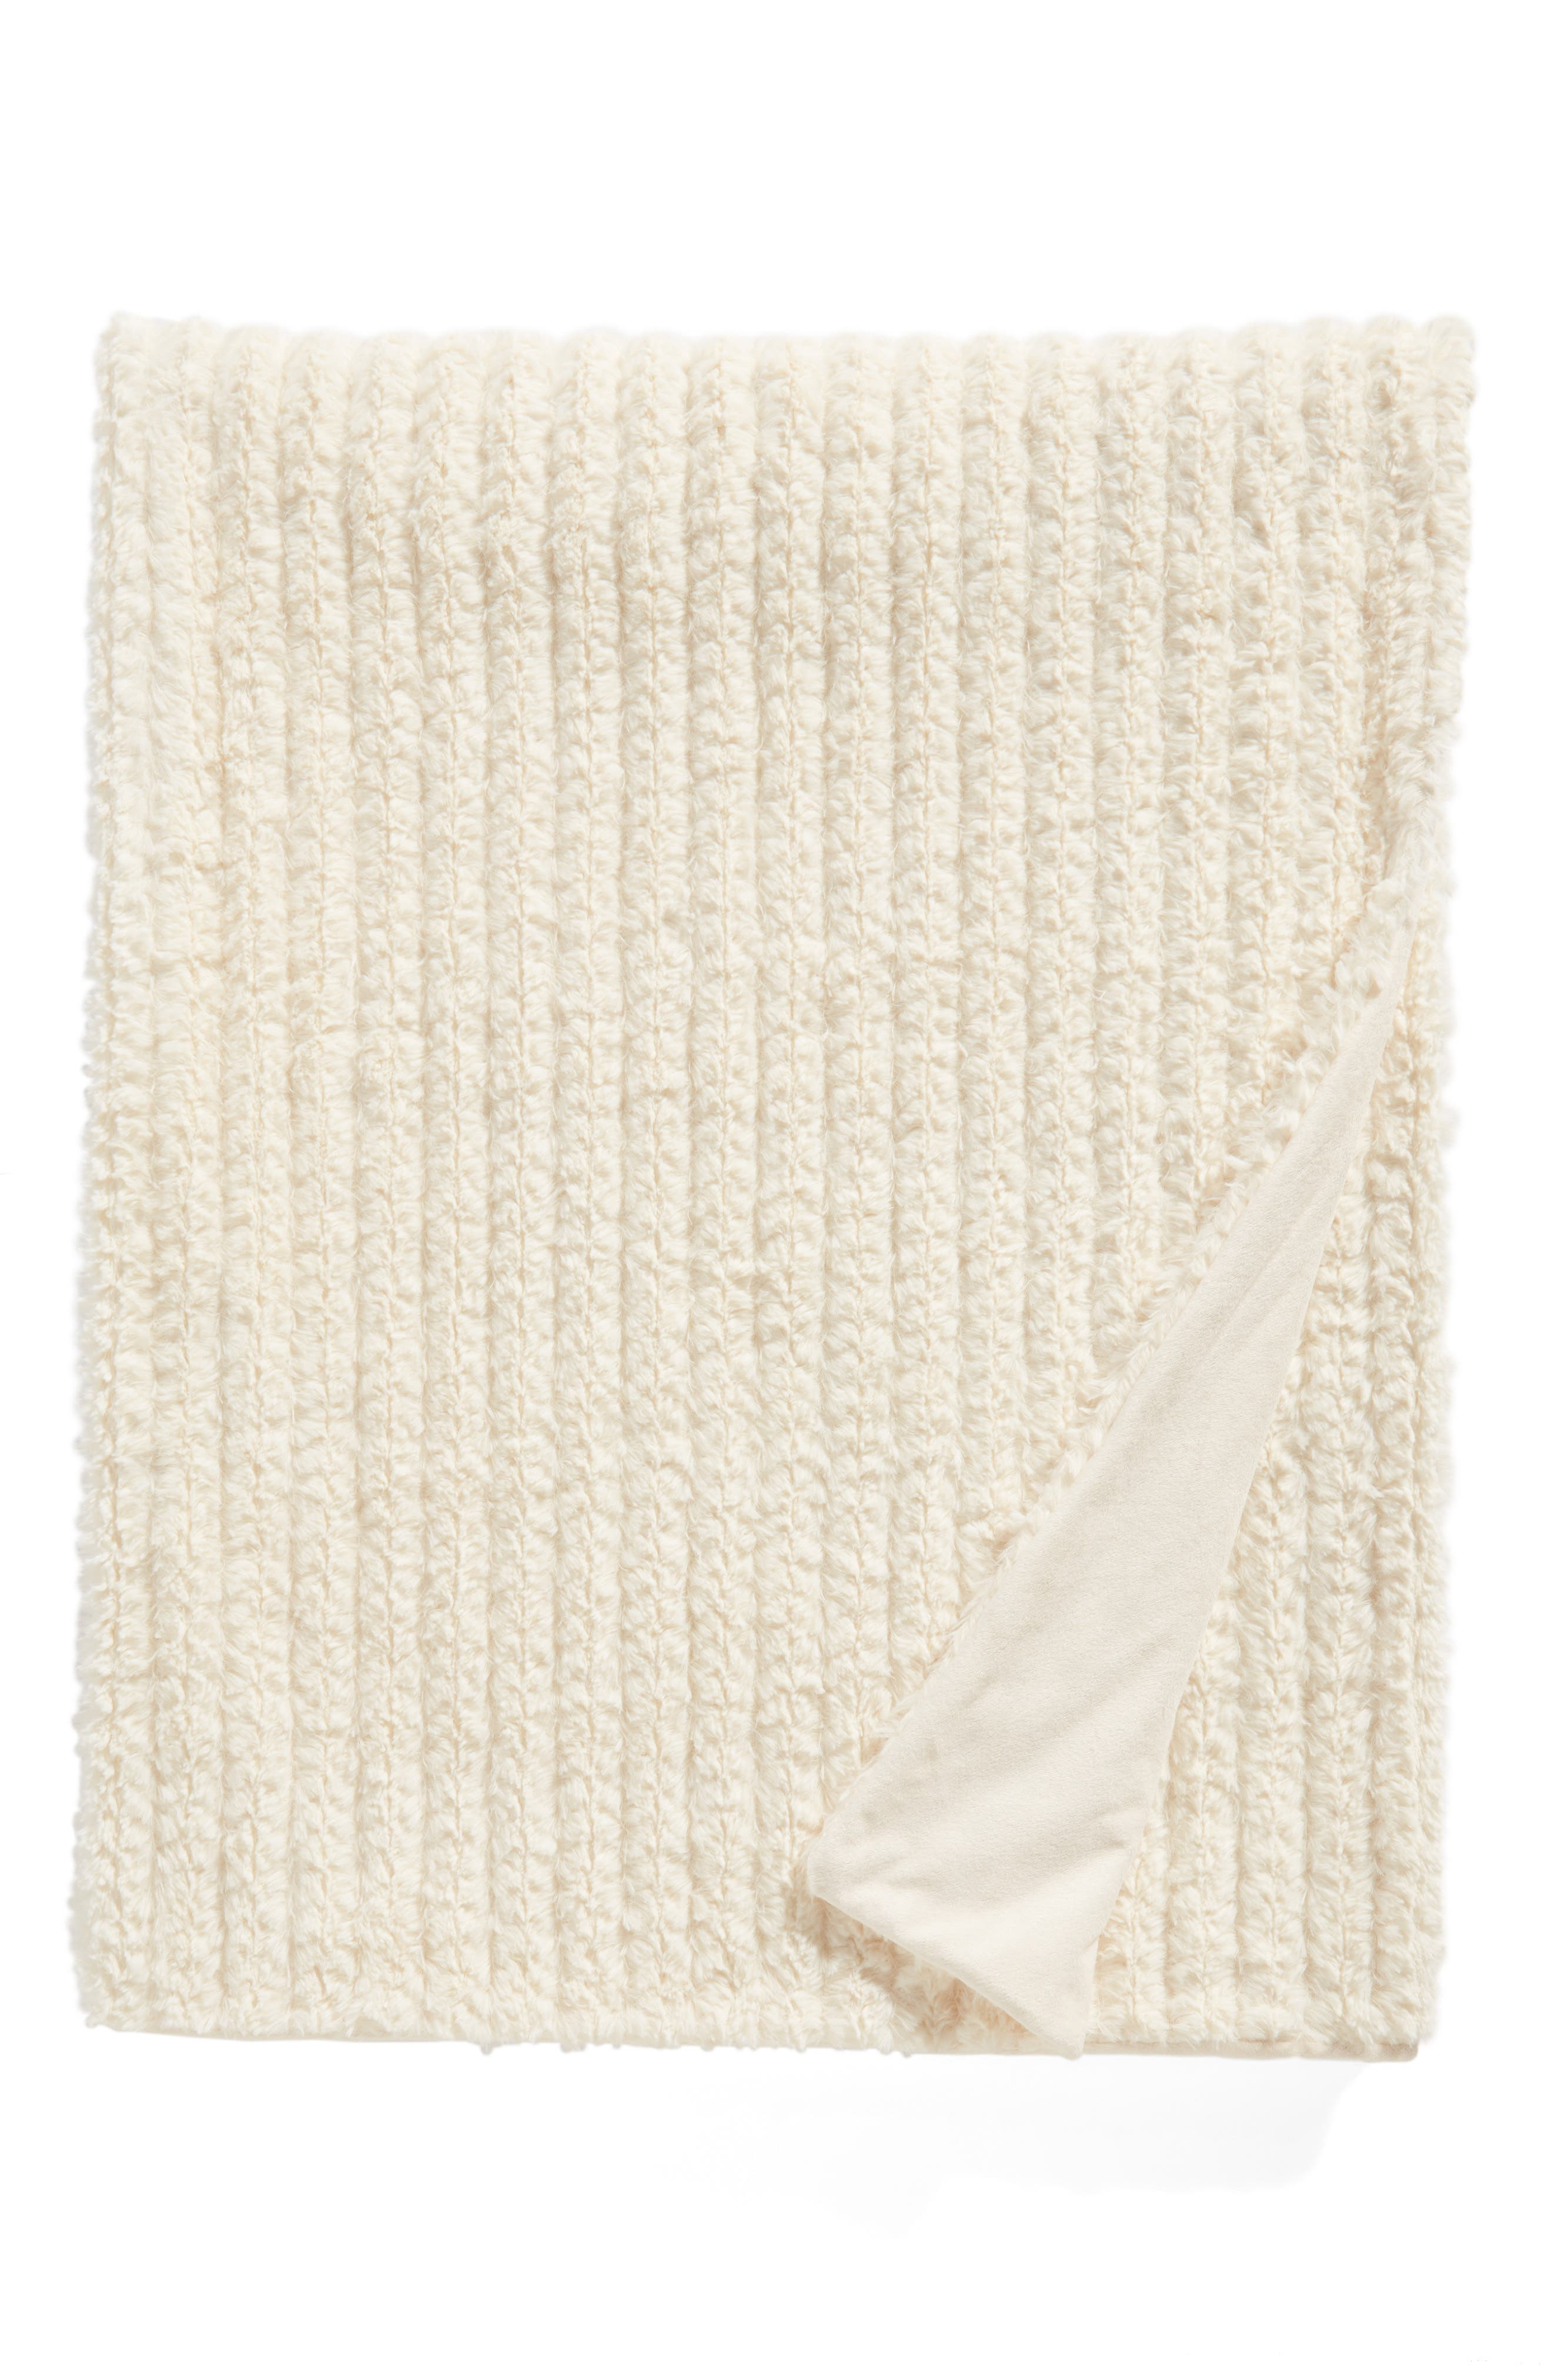 Nordstrom Cozy Plush Faux Fur Blanket,                             Main thumbnail 1, color,                             IVORY SOLID